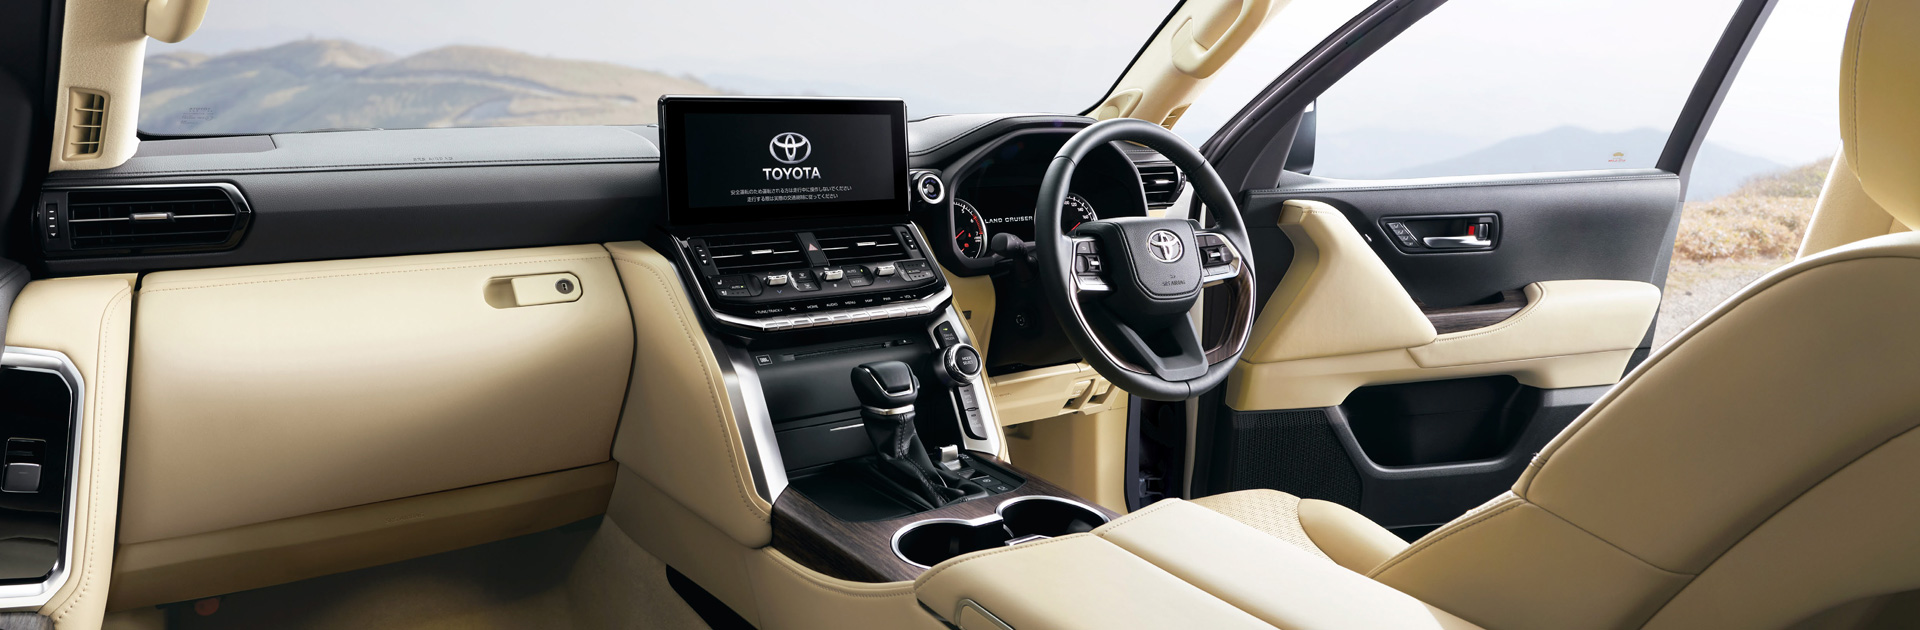 Toyota Launches New Land Cruiser - Image 2